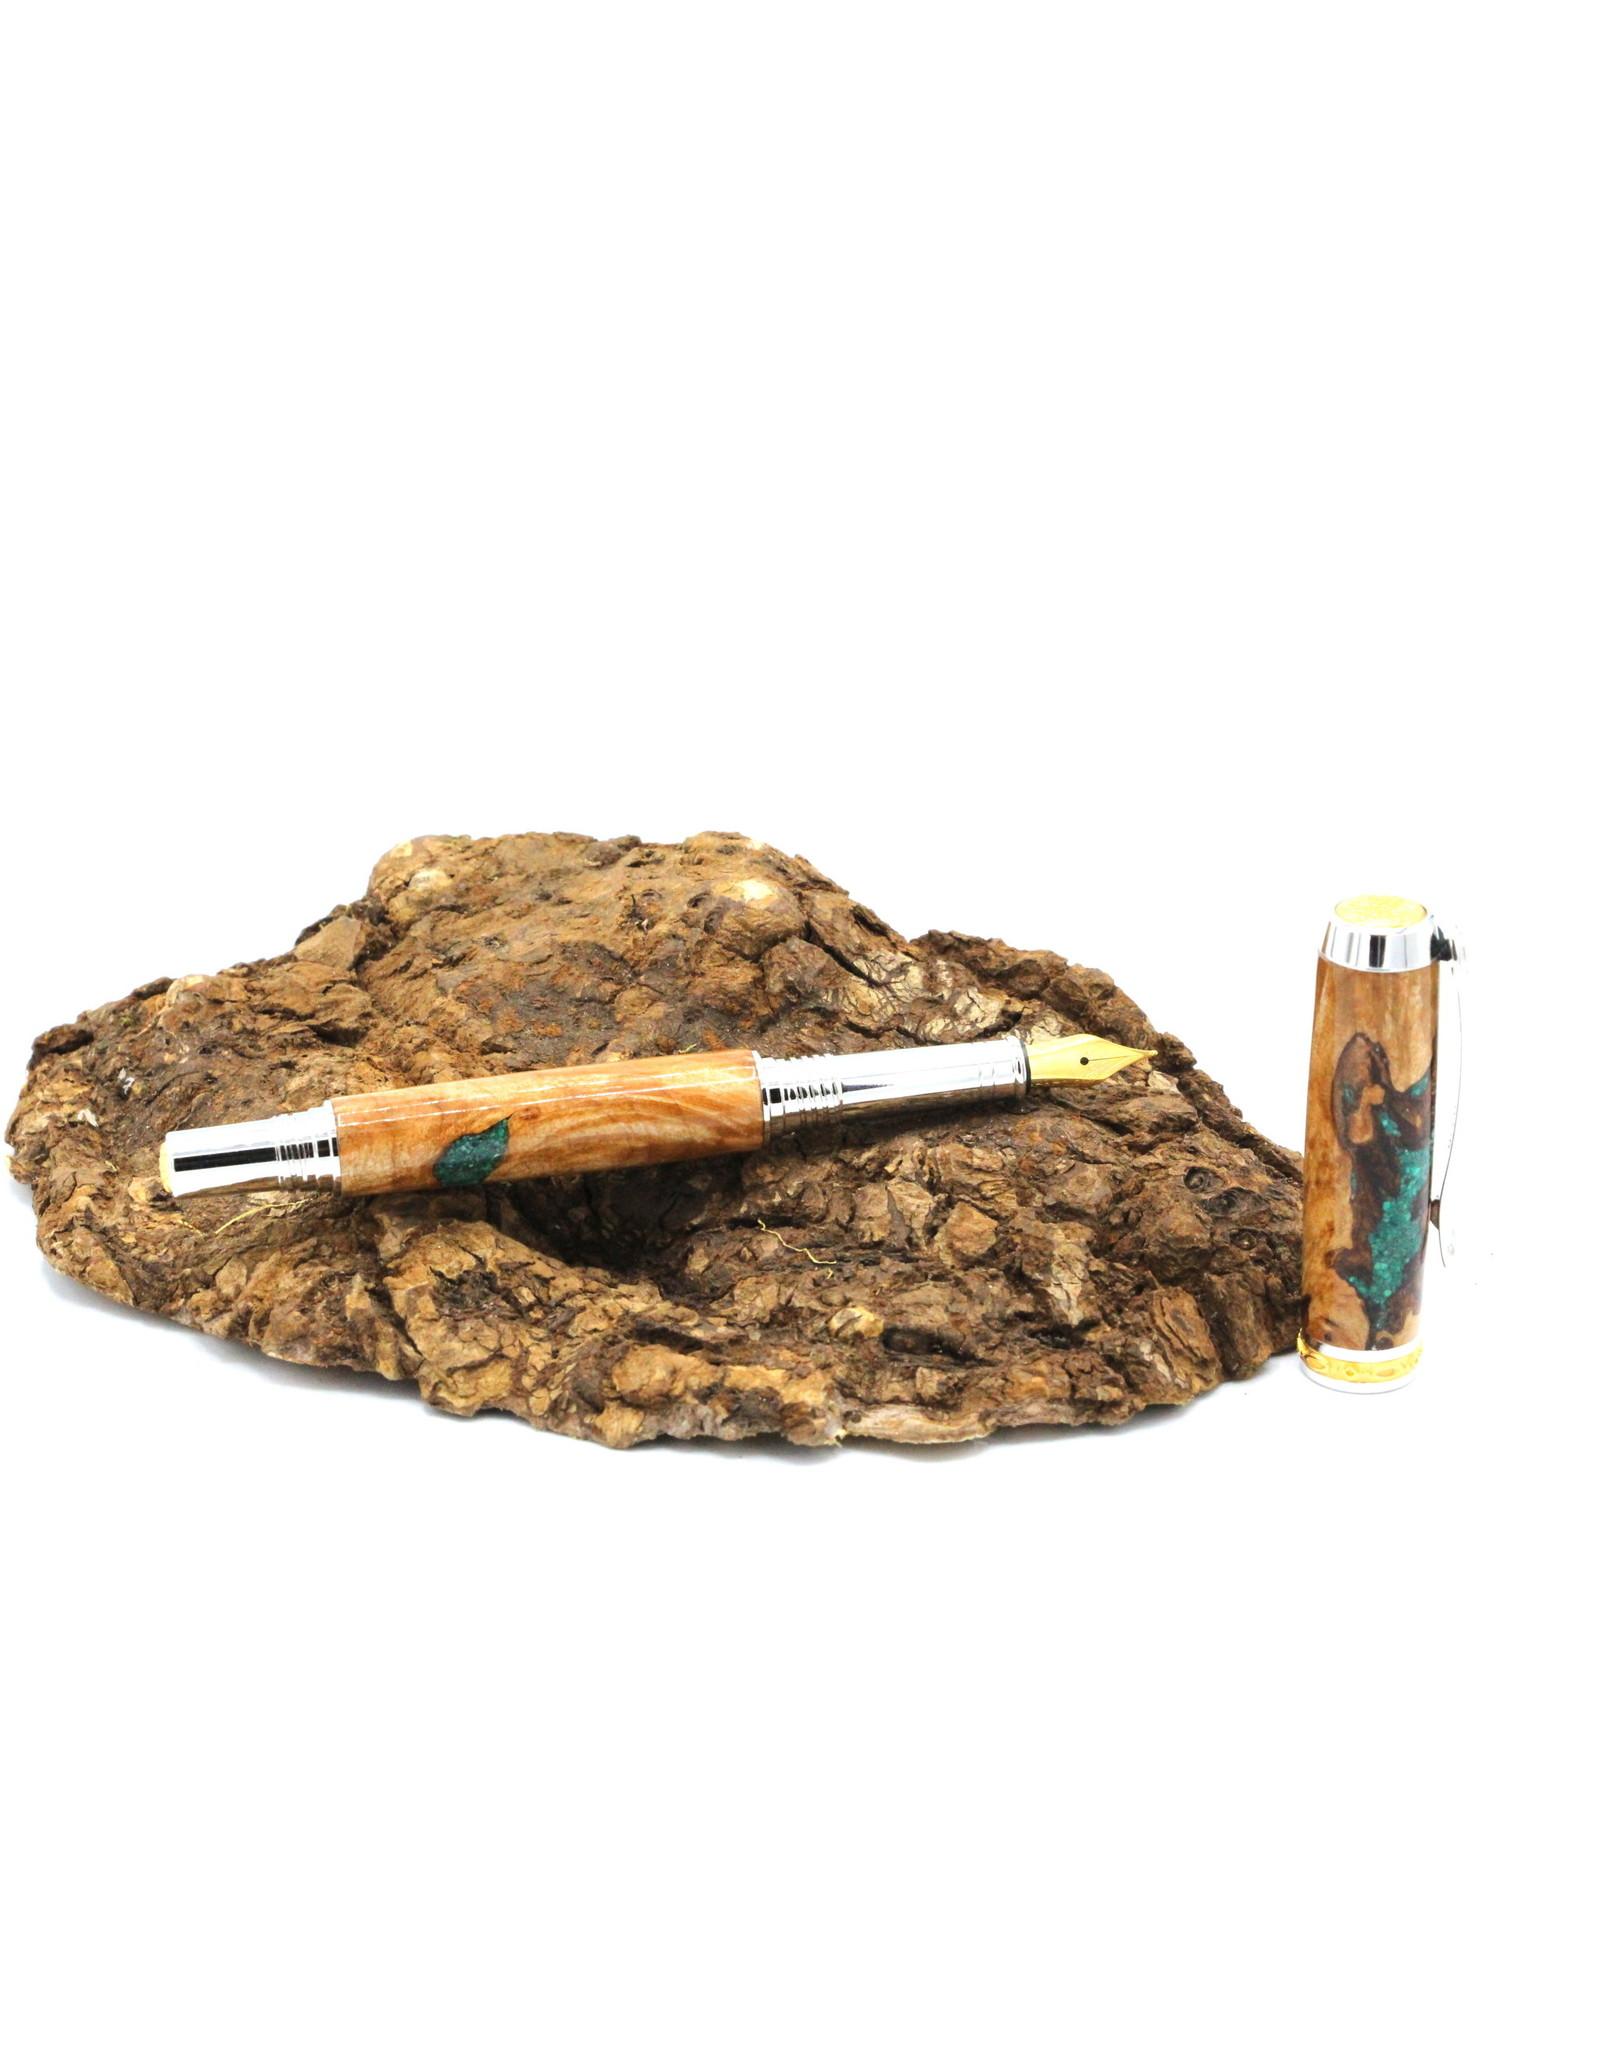 Maple Fountain Pen - Berezia Malachite Gold